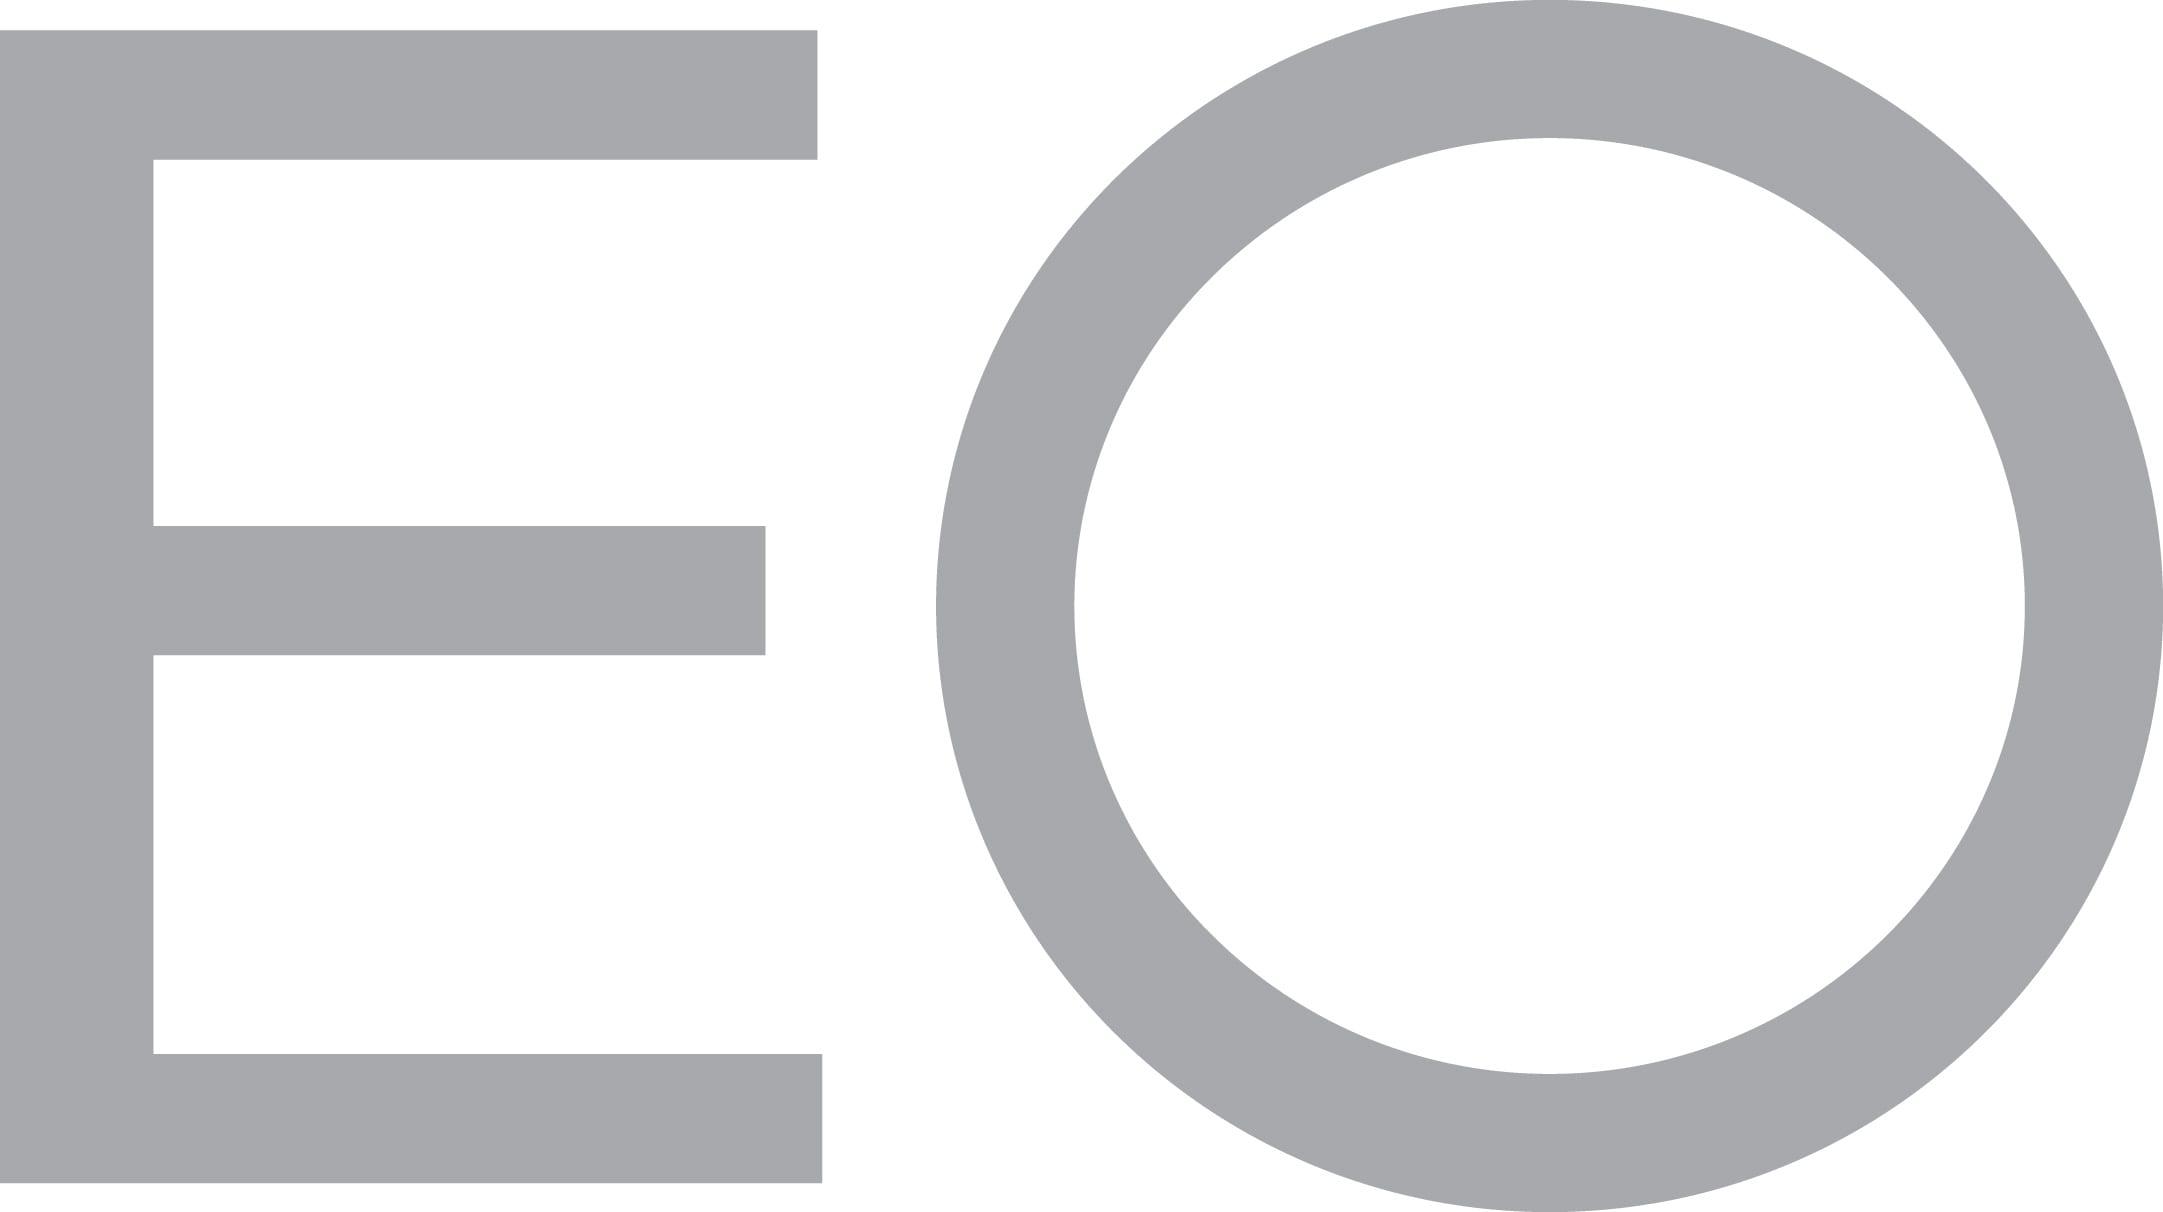 EO_logo_grey_2019